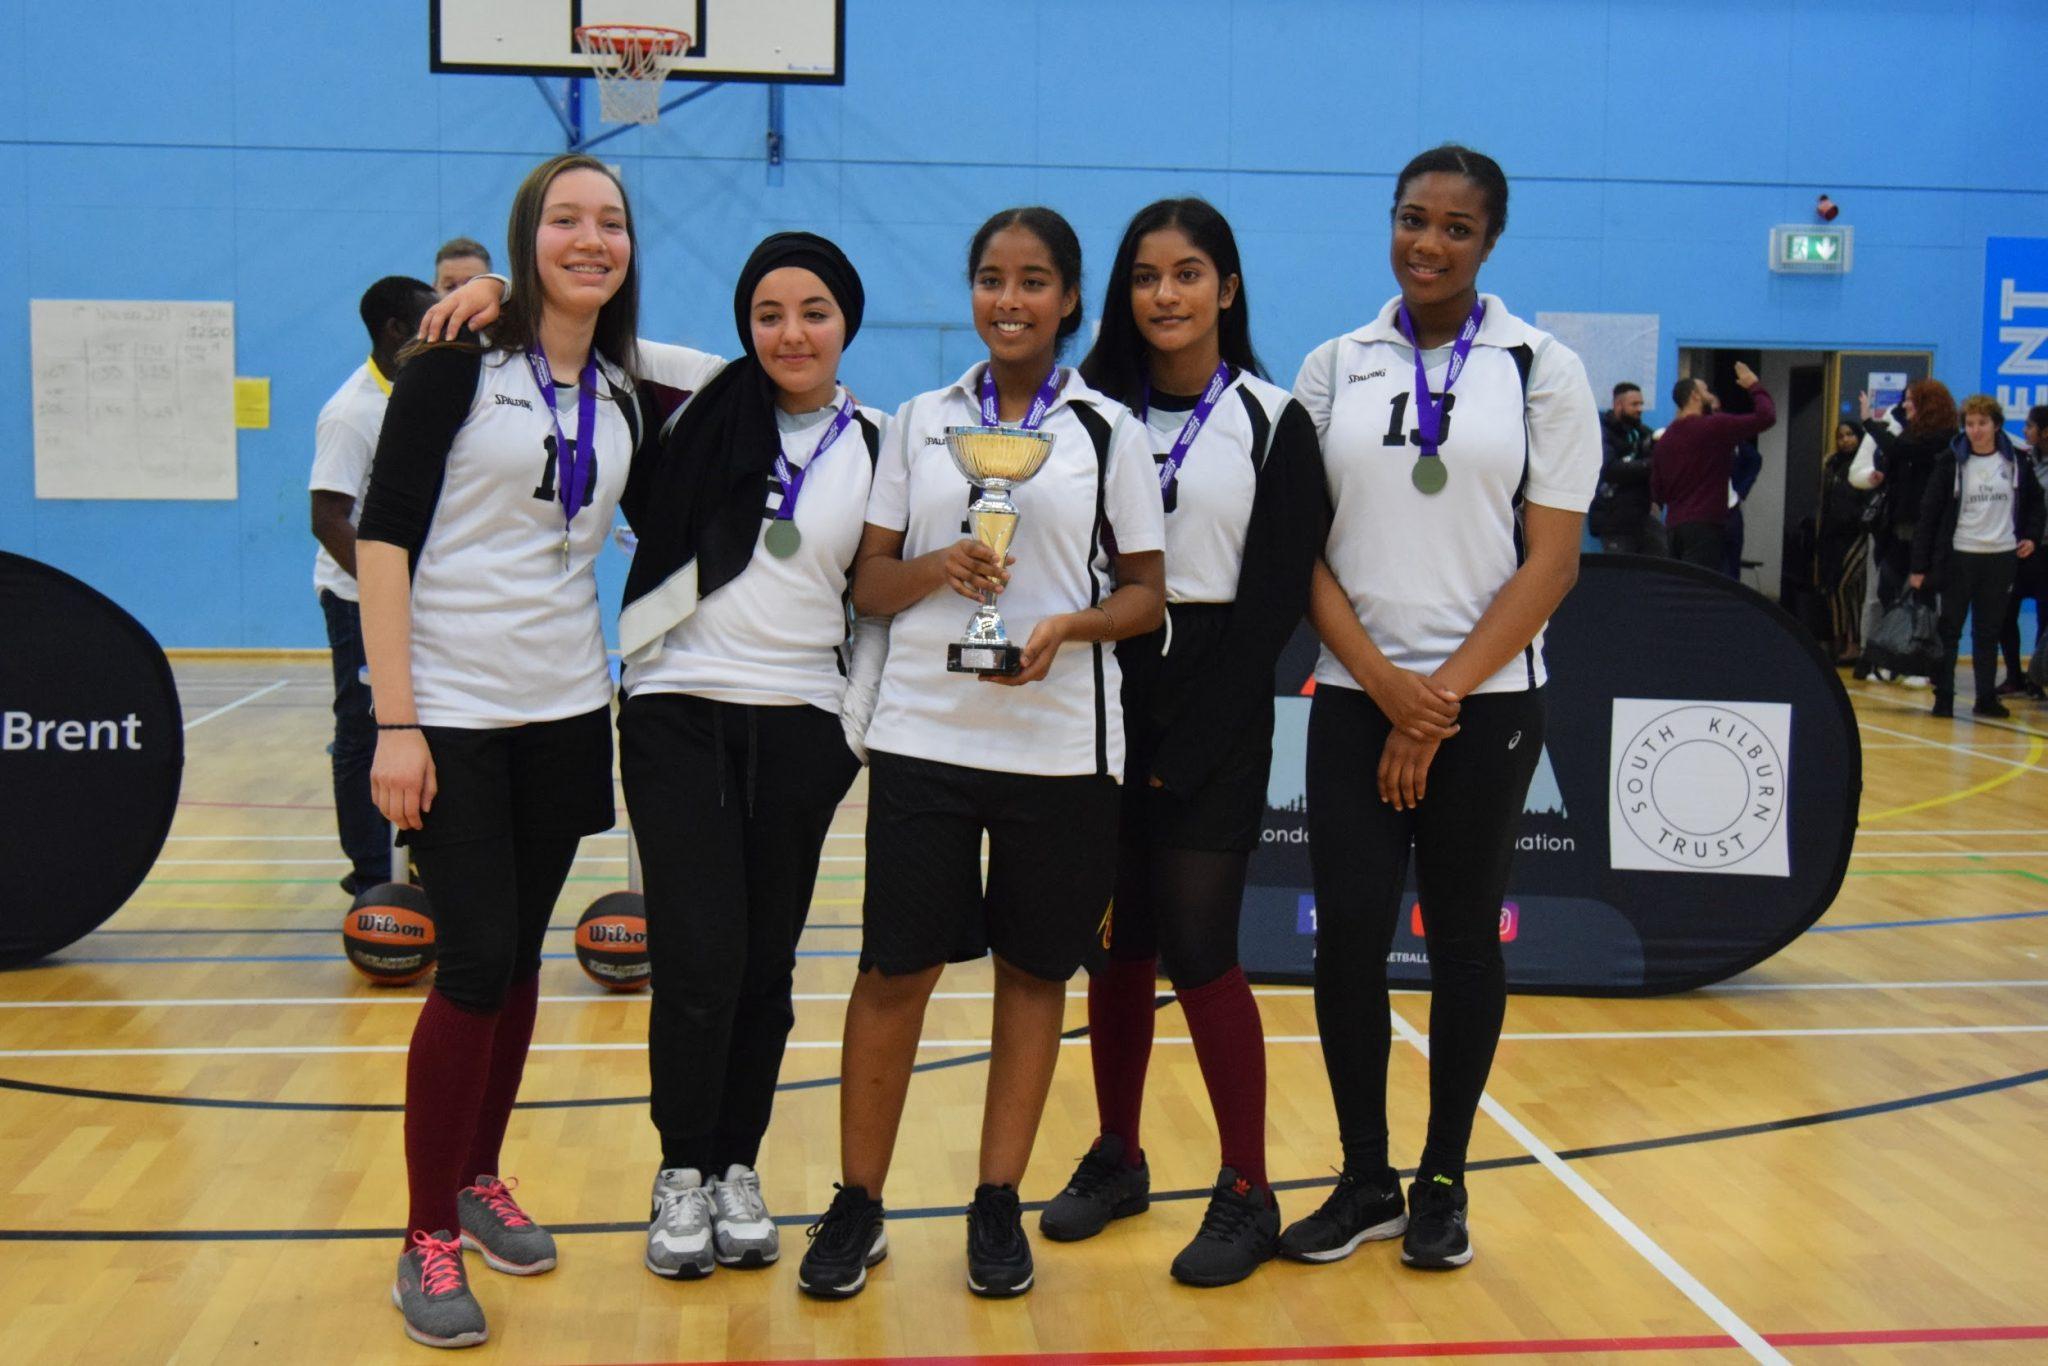 Brent U16 Girls Champions: Ark Academy